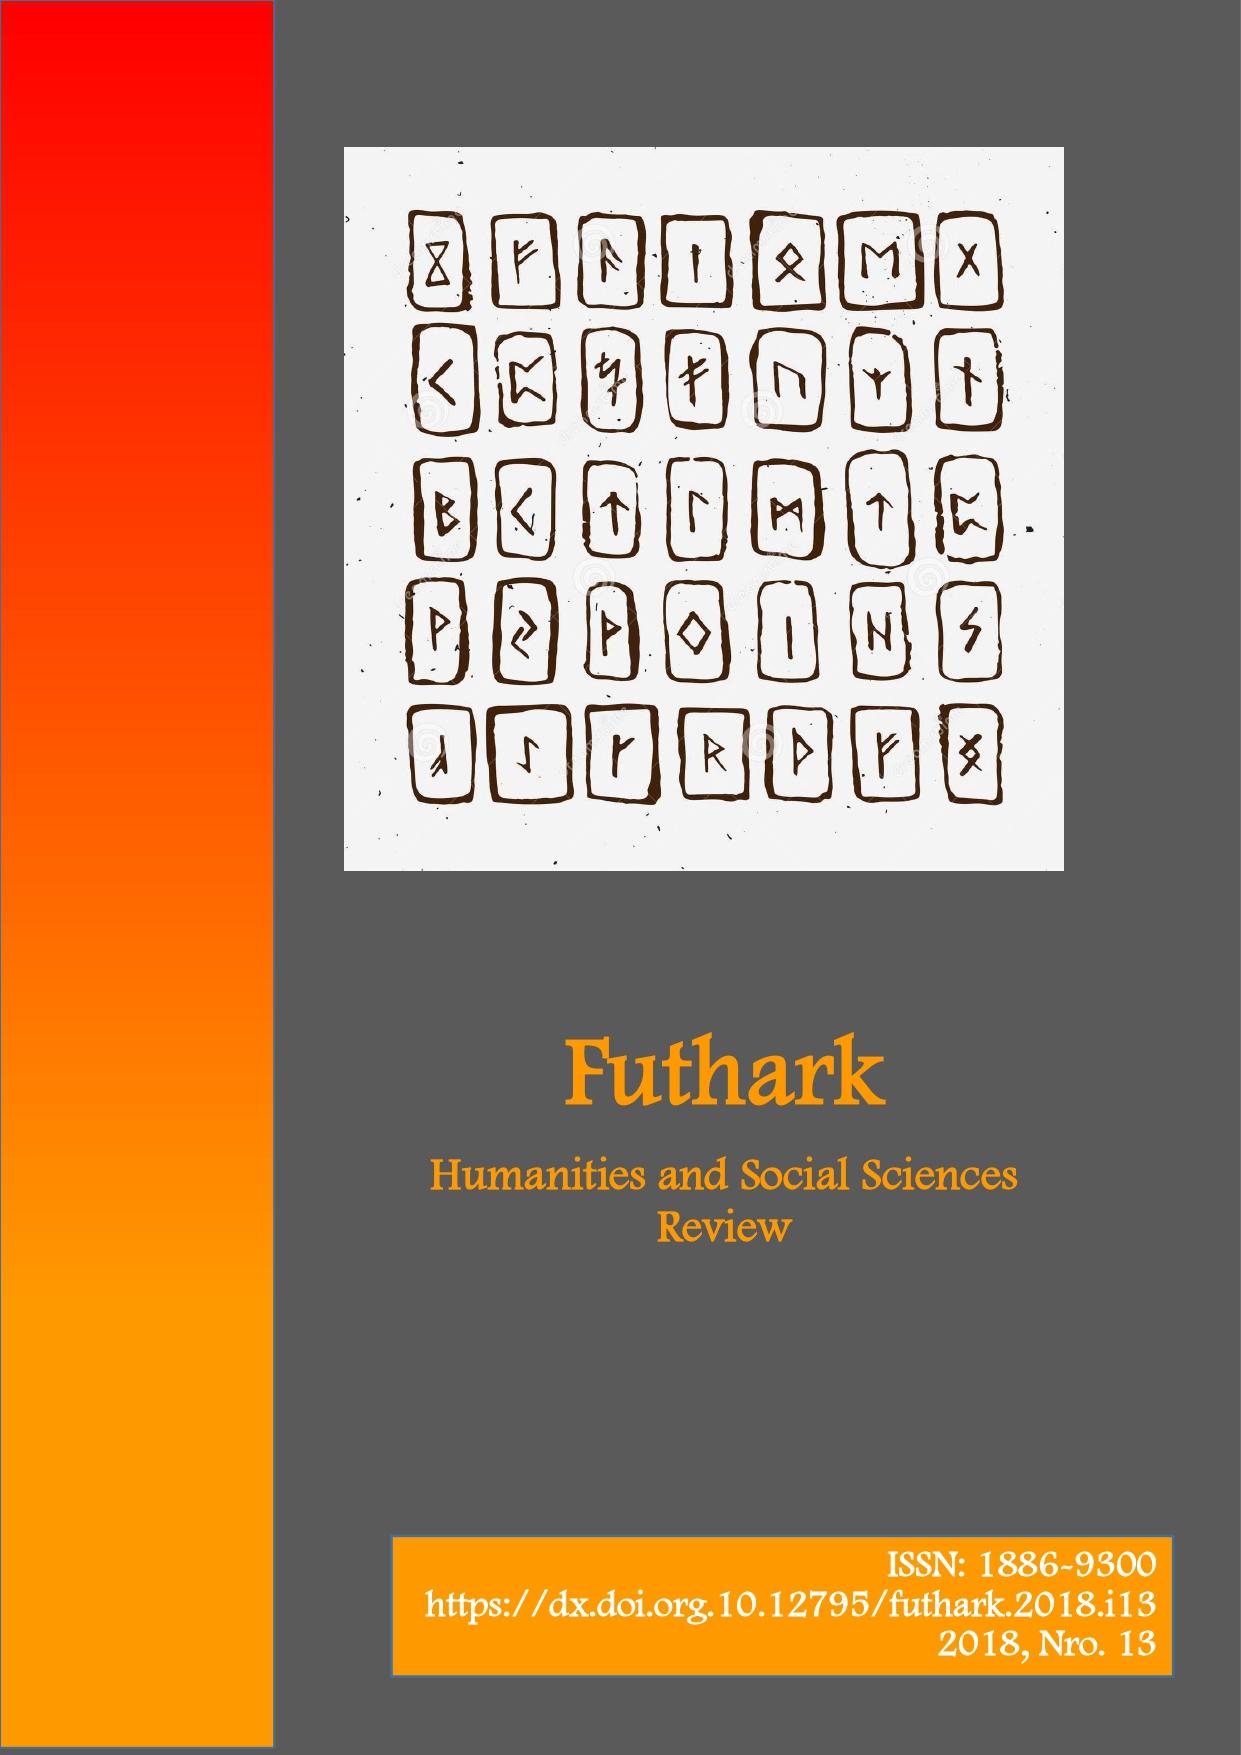 Ver Núm. 13 (2018): Futhark